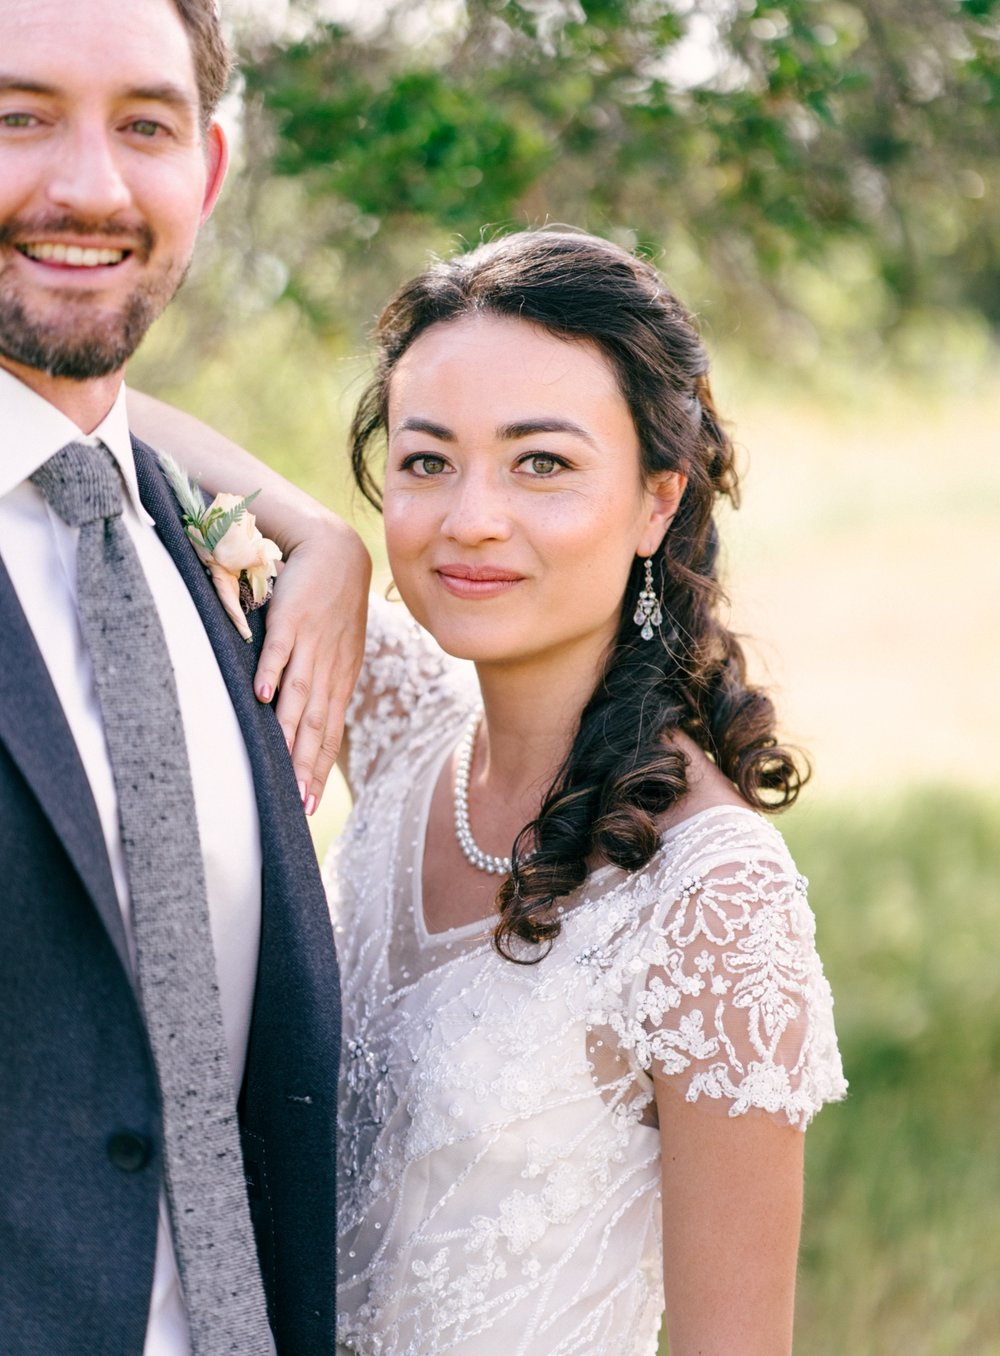 INTIMATE WEDDING AT A PRIVATE ESTATE IN OJAI